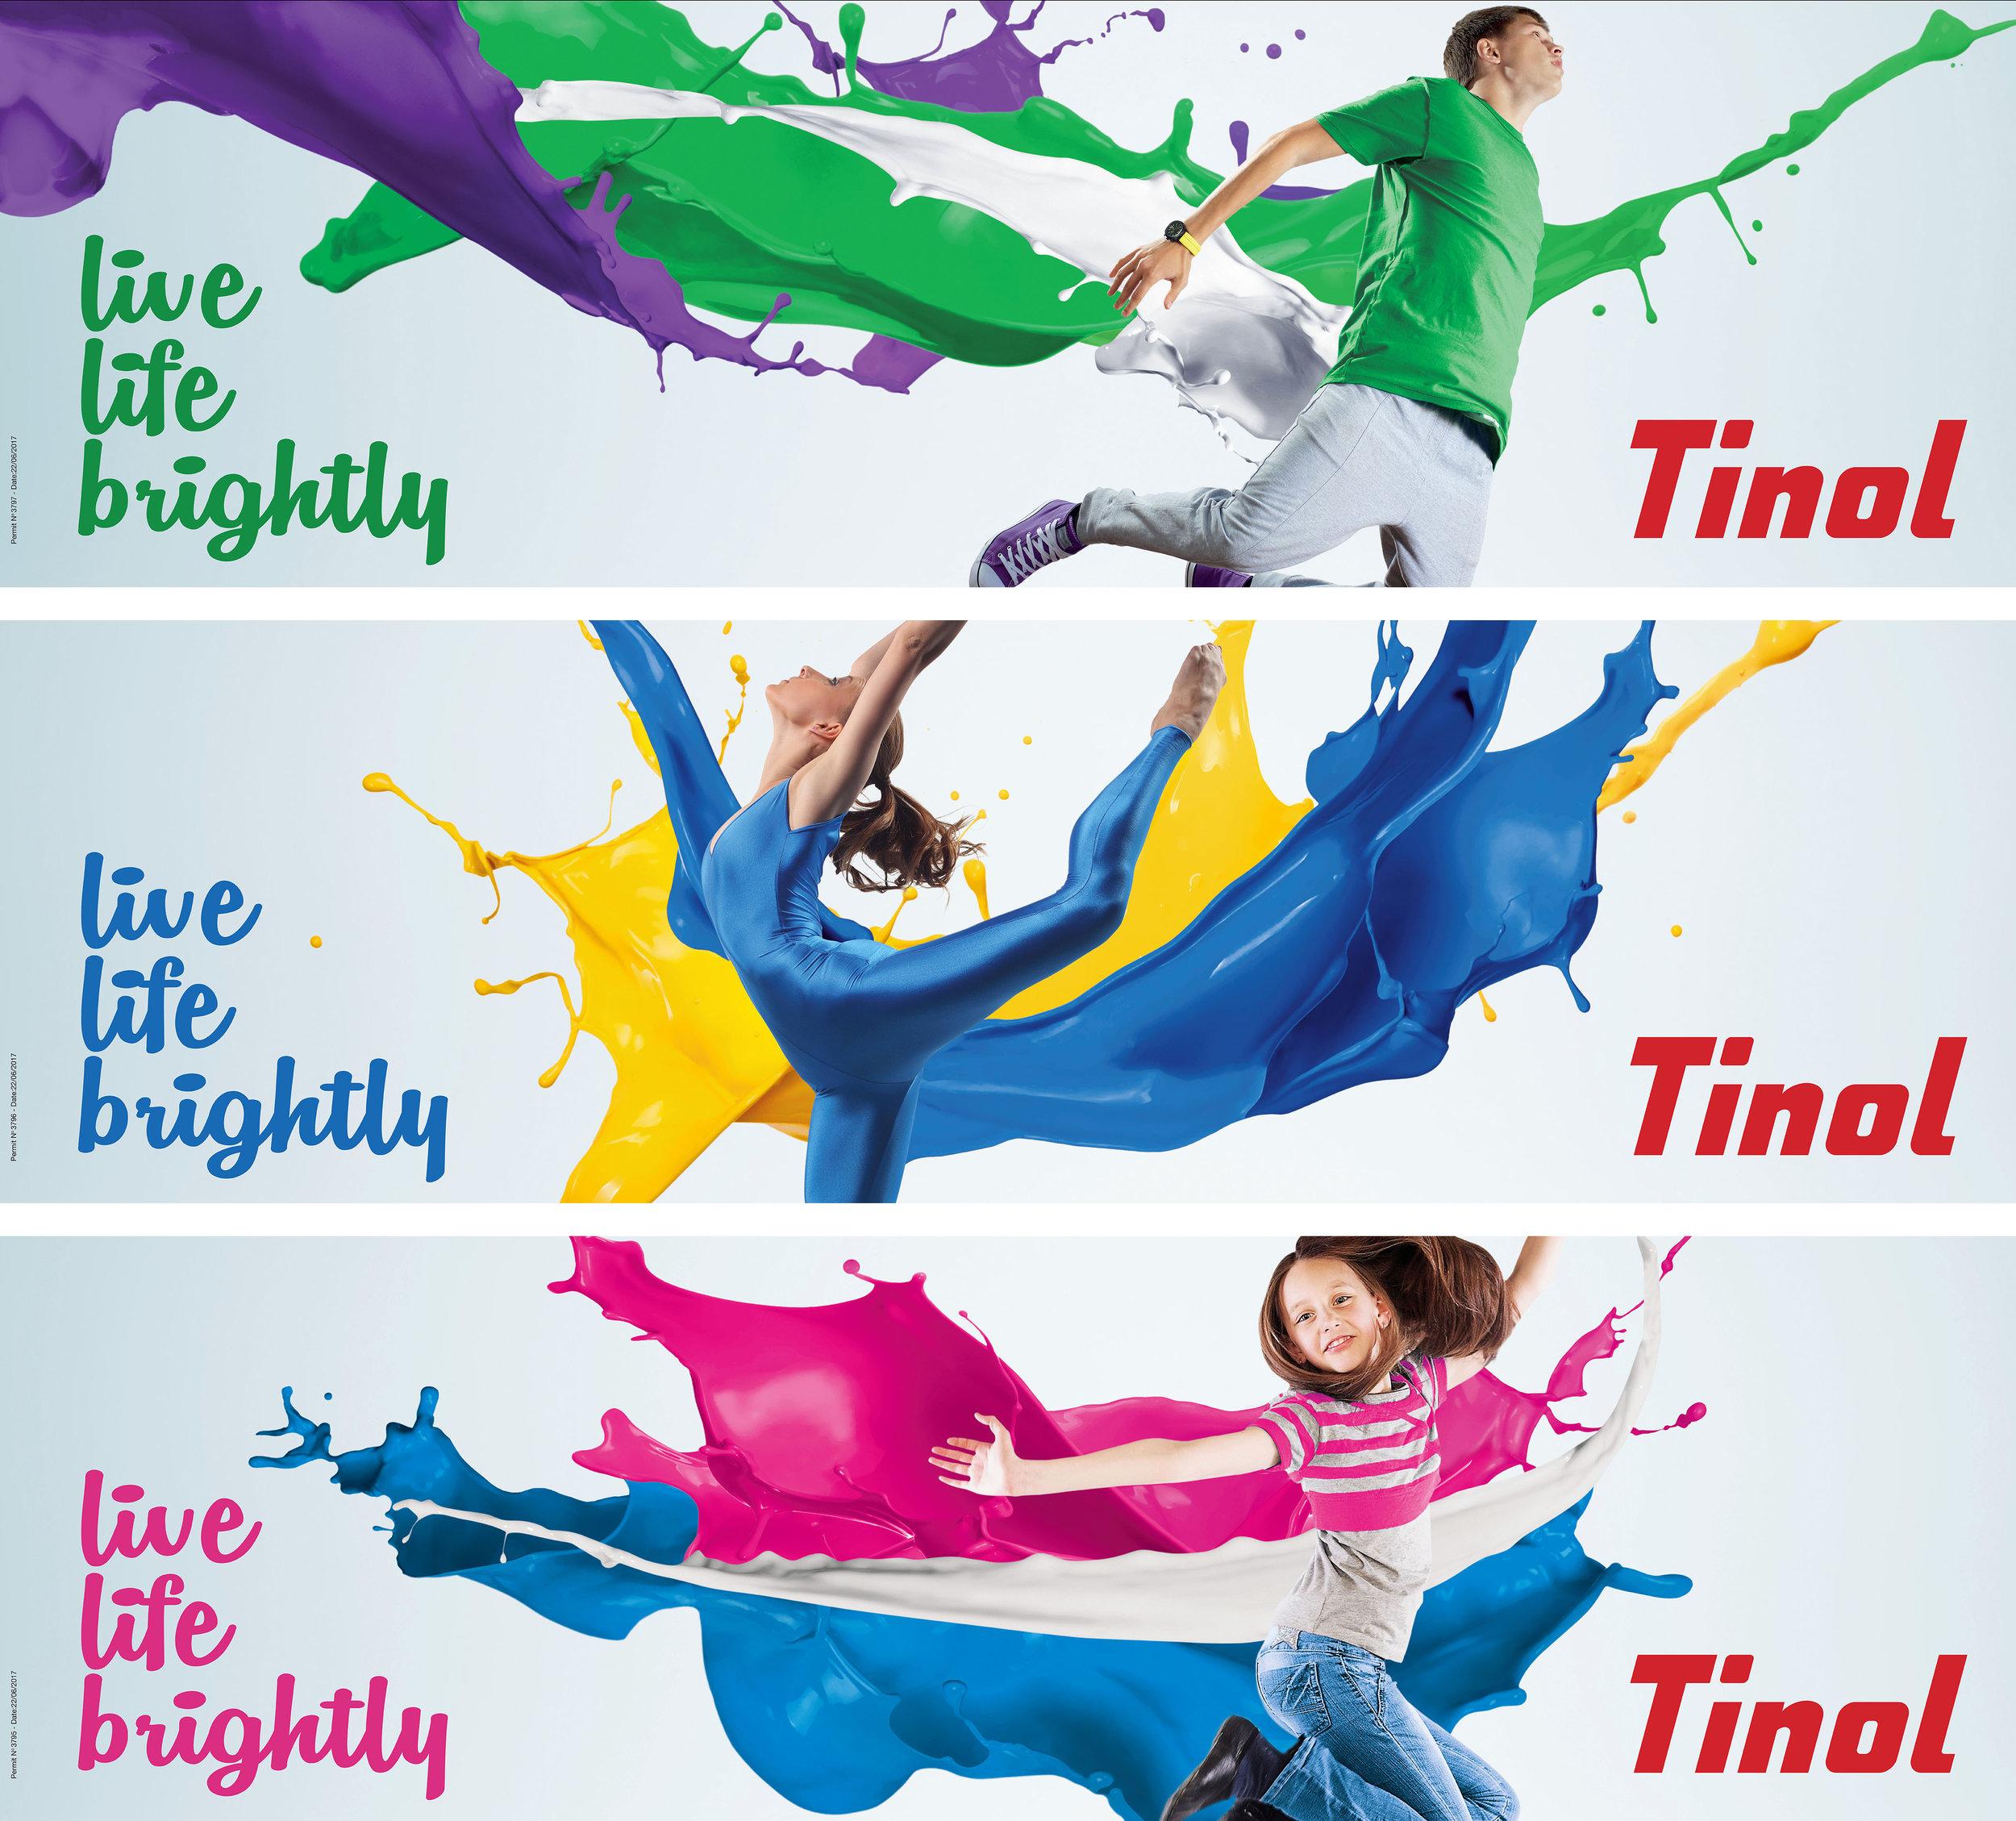 Tinol 'live life brightly'